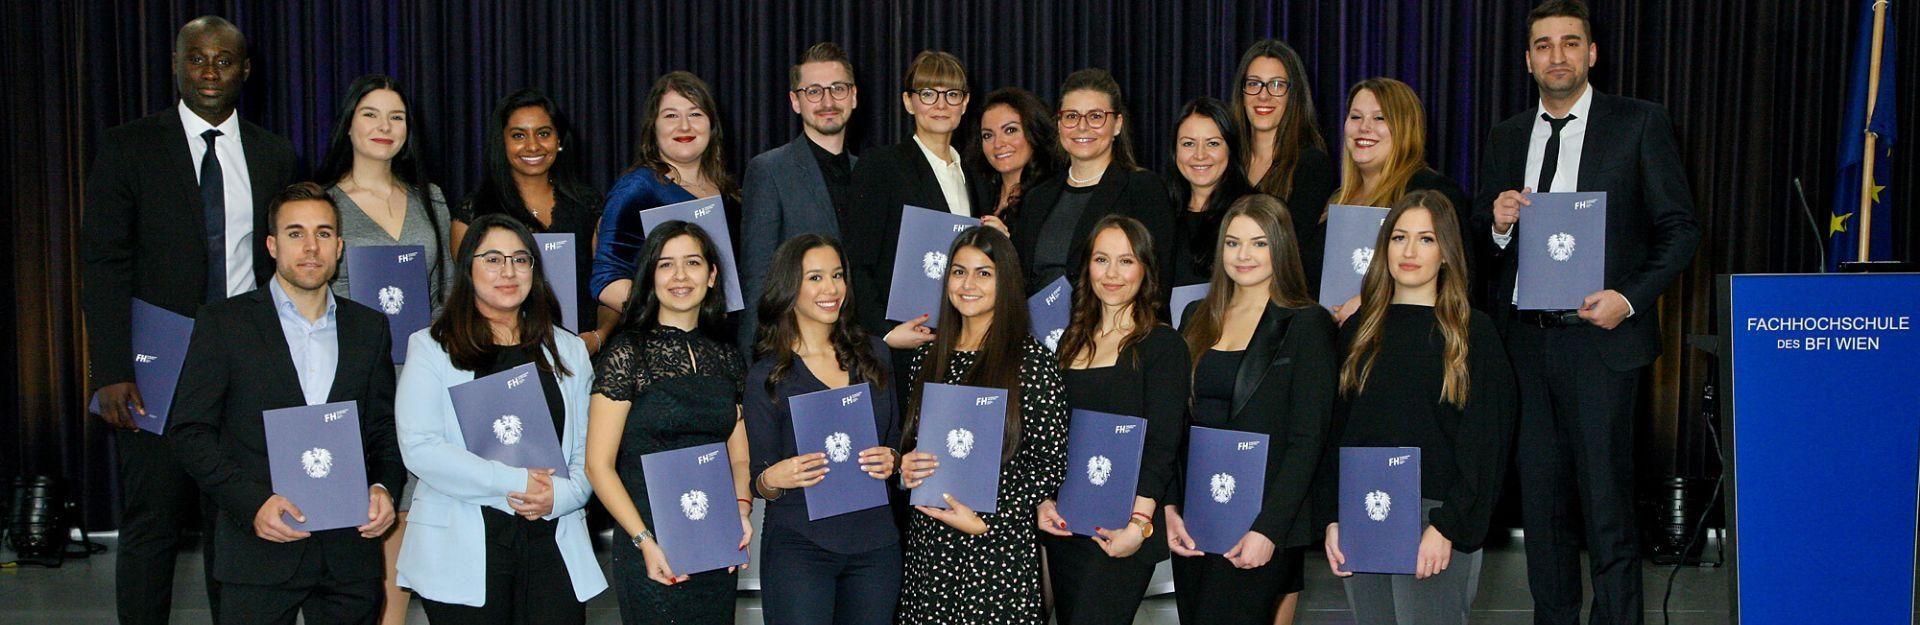 graduates of the university of applied sciences bfi vienna